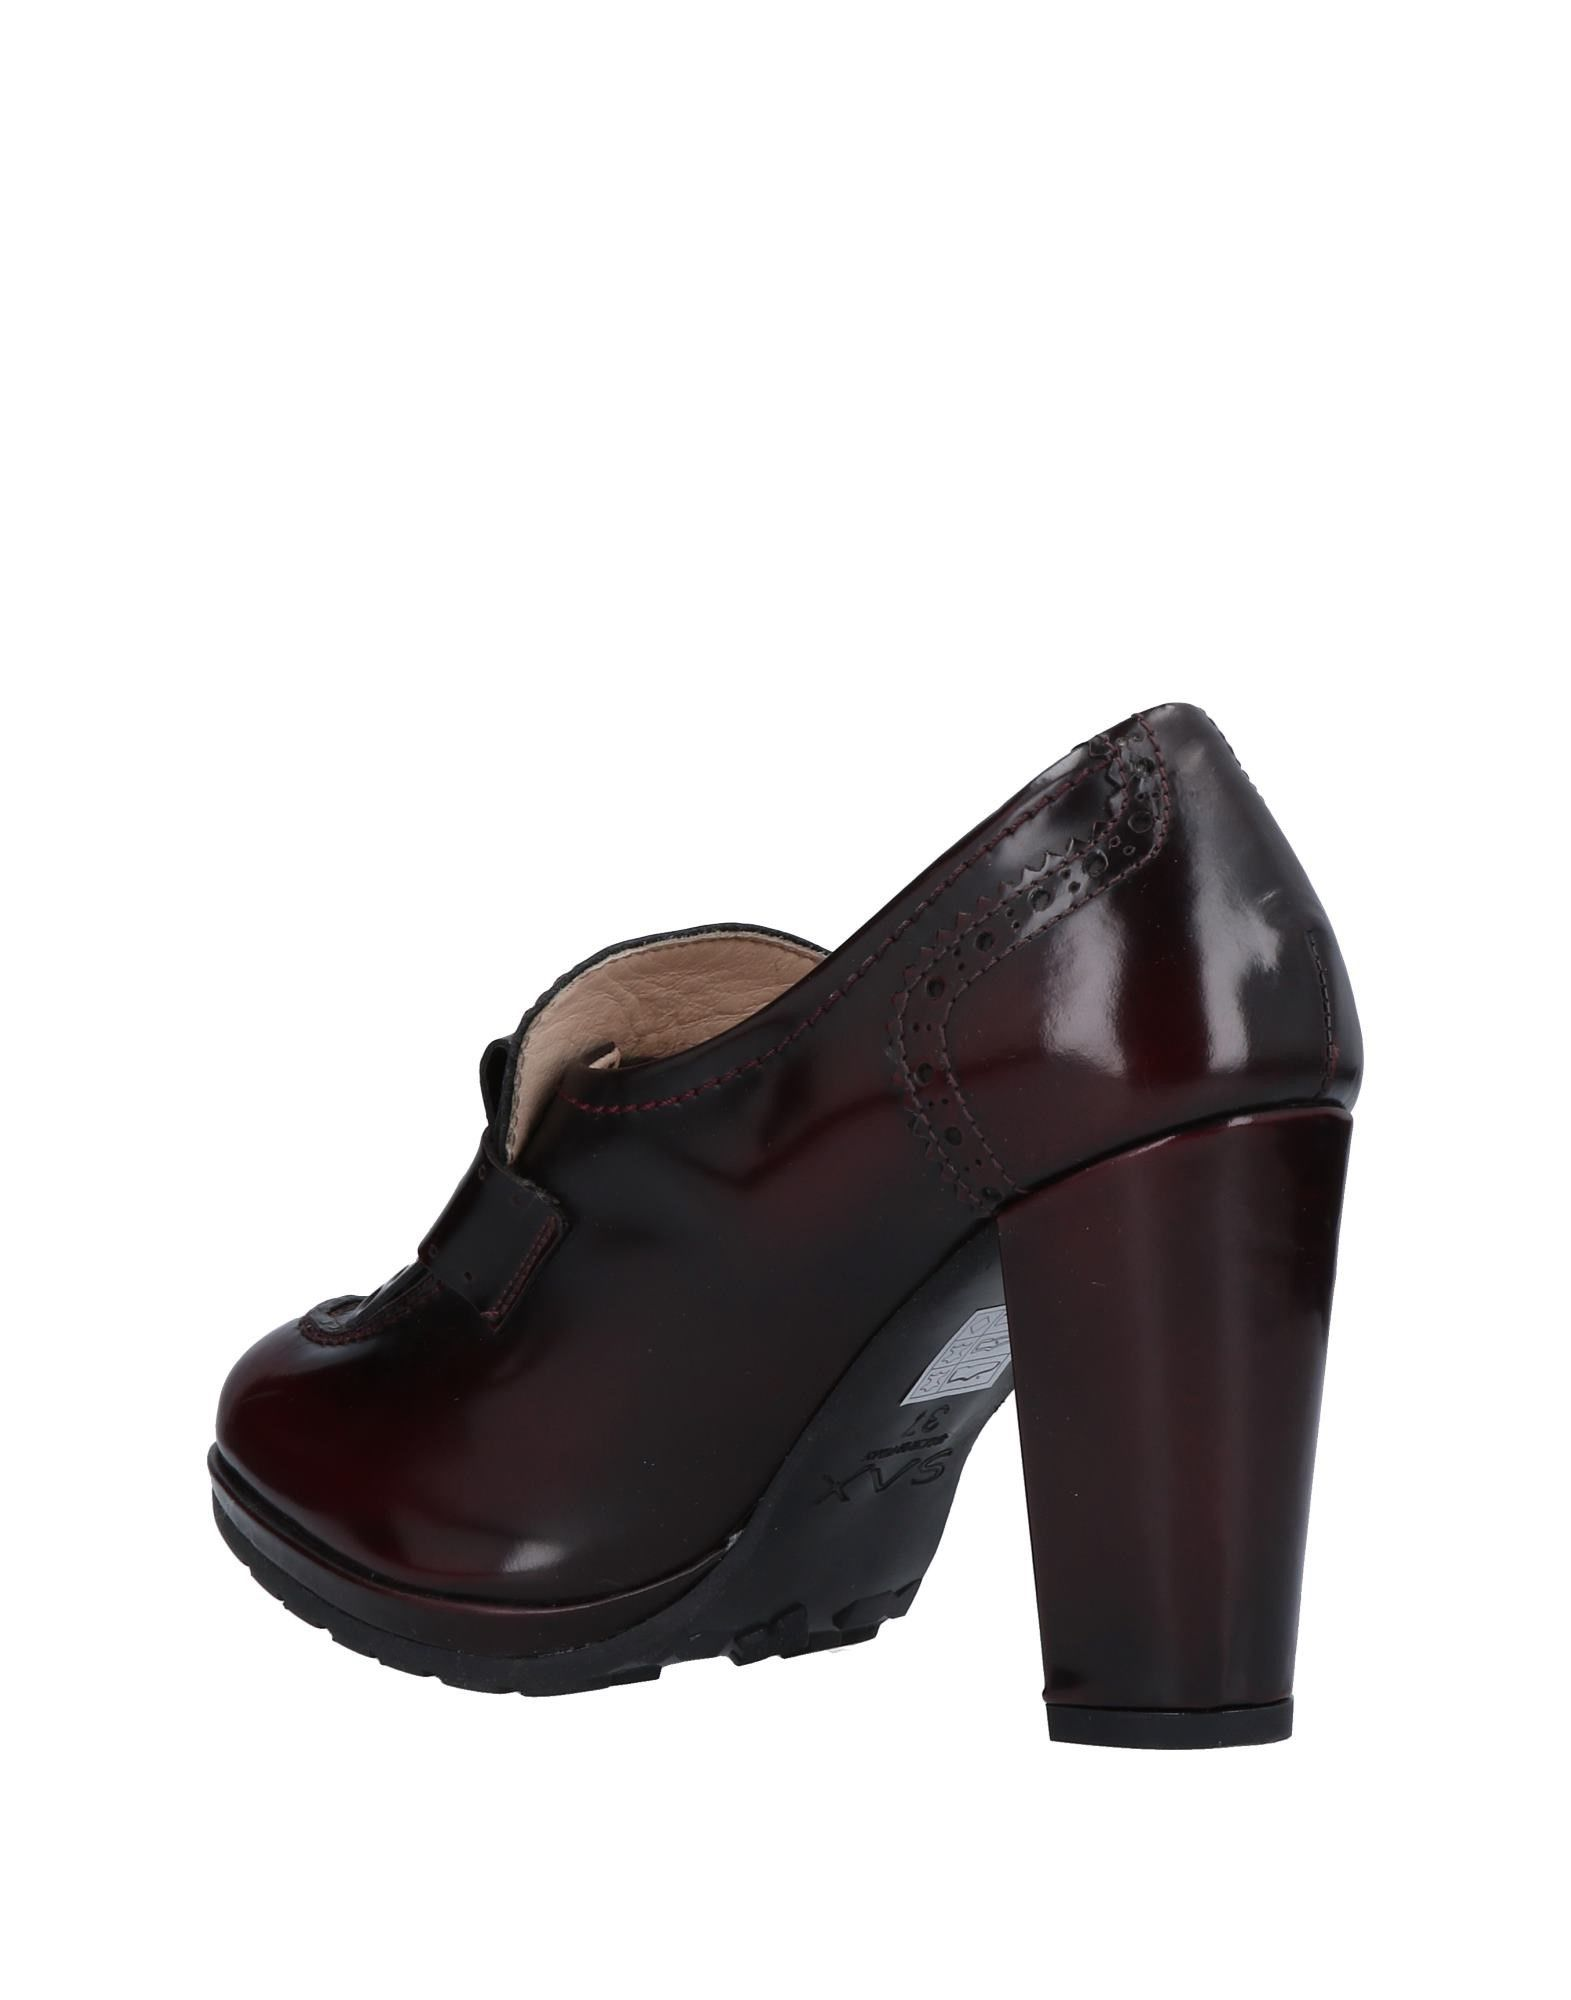 Sax Mokassins Damen  11506110SW Gute Qualität beliebte Schuhe